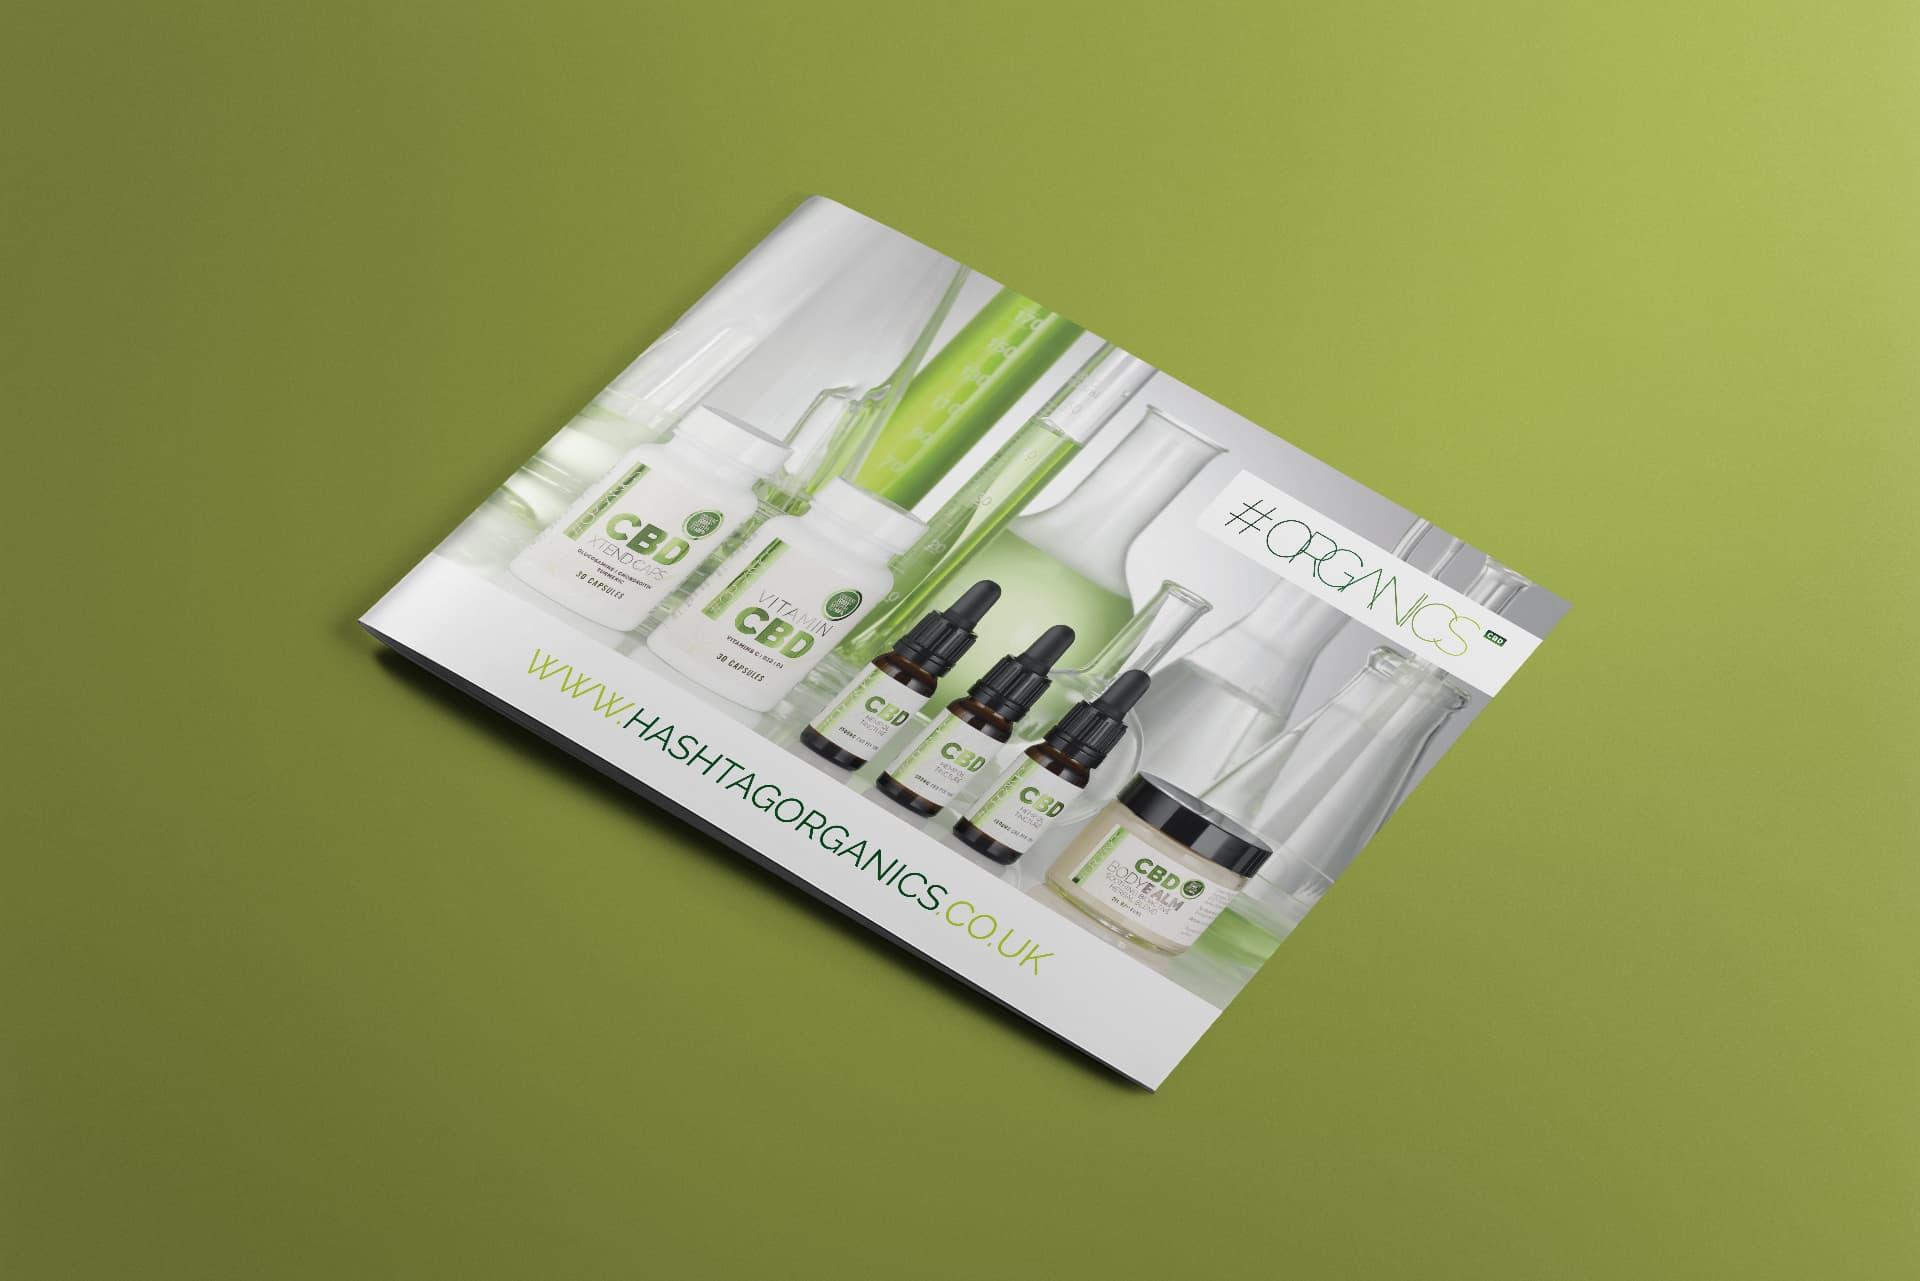 Hashtag Organics Information Brochure